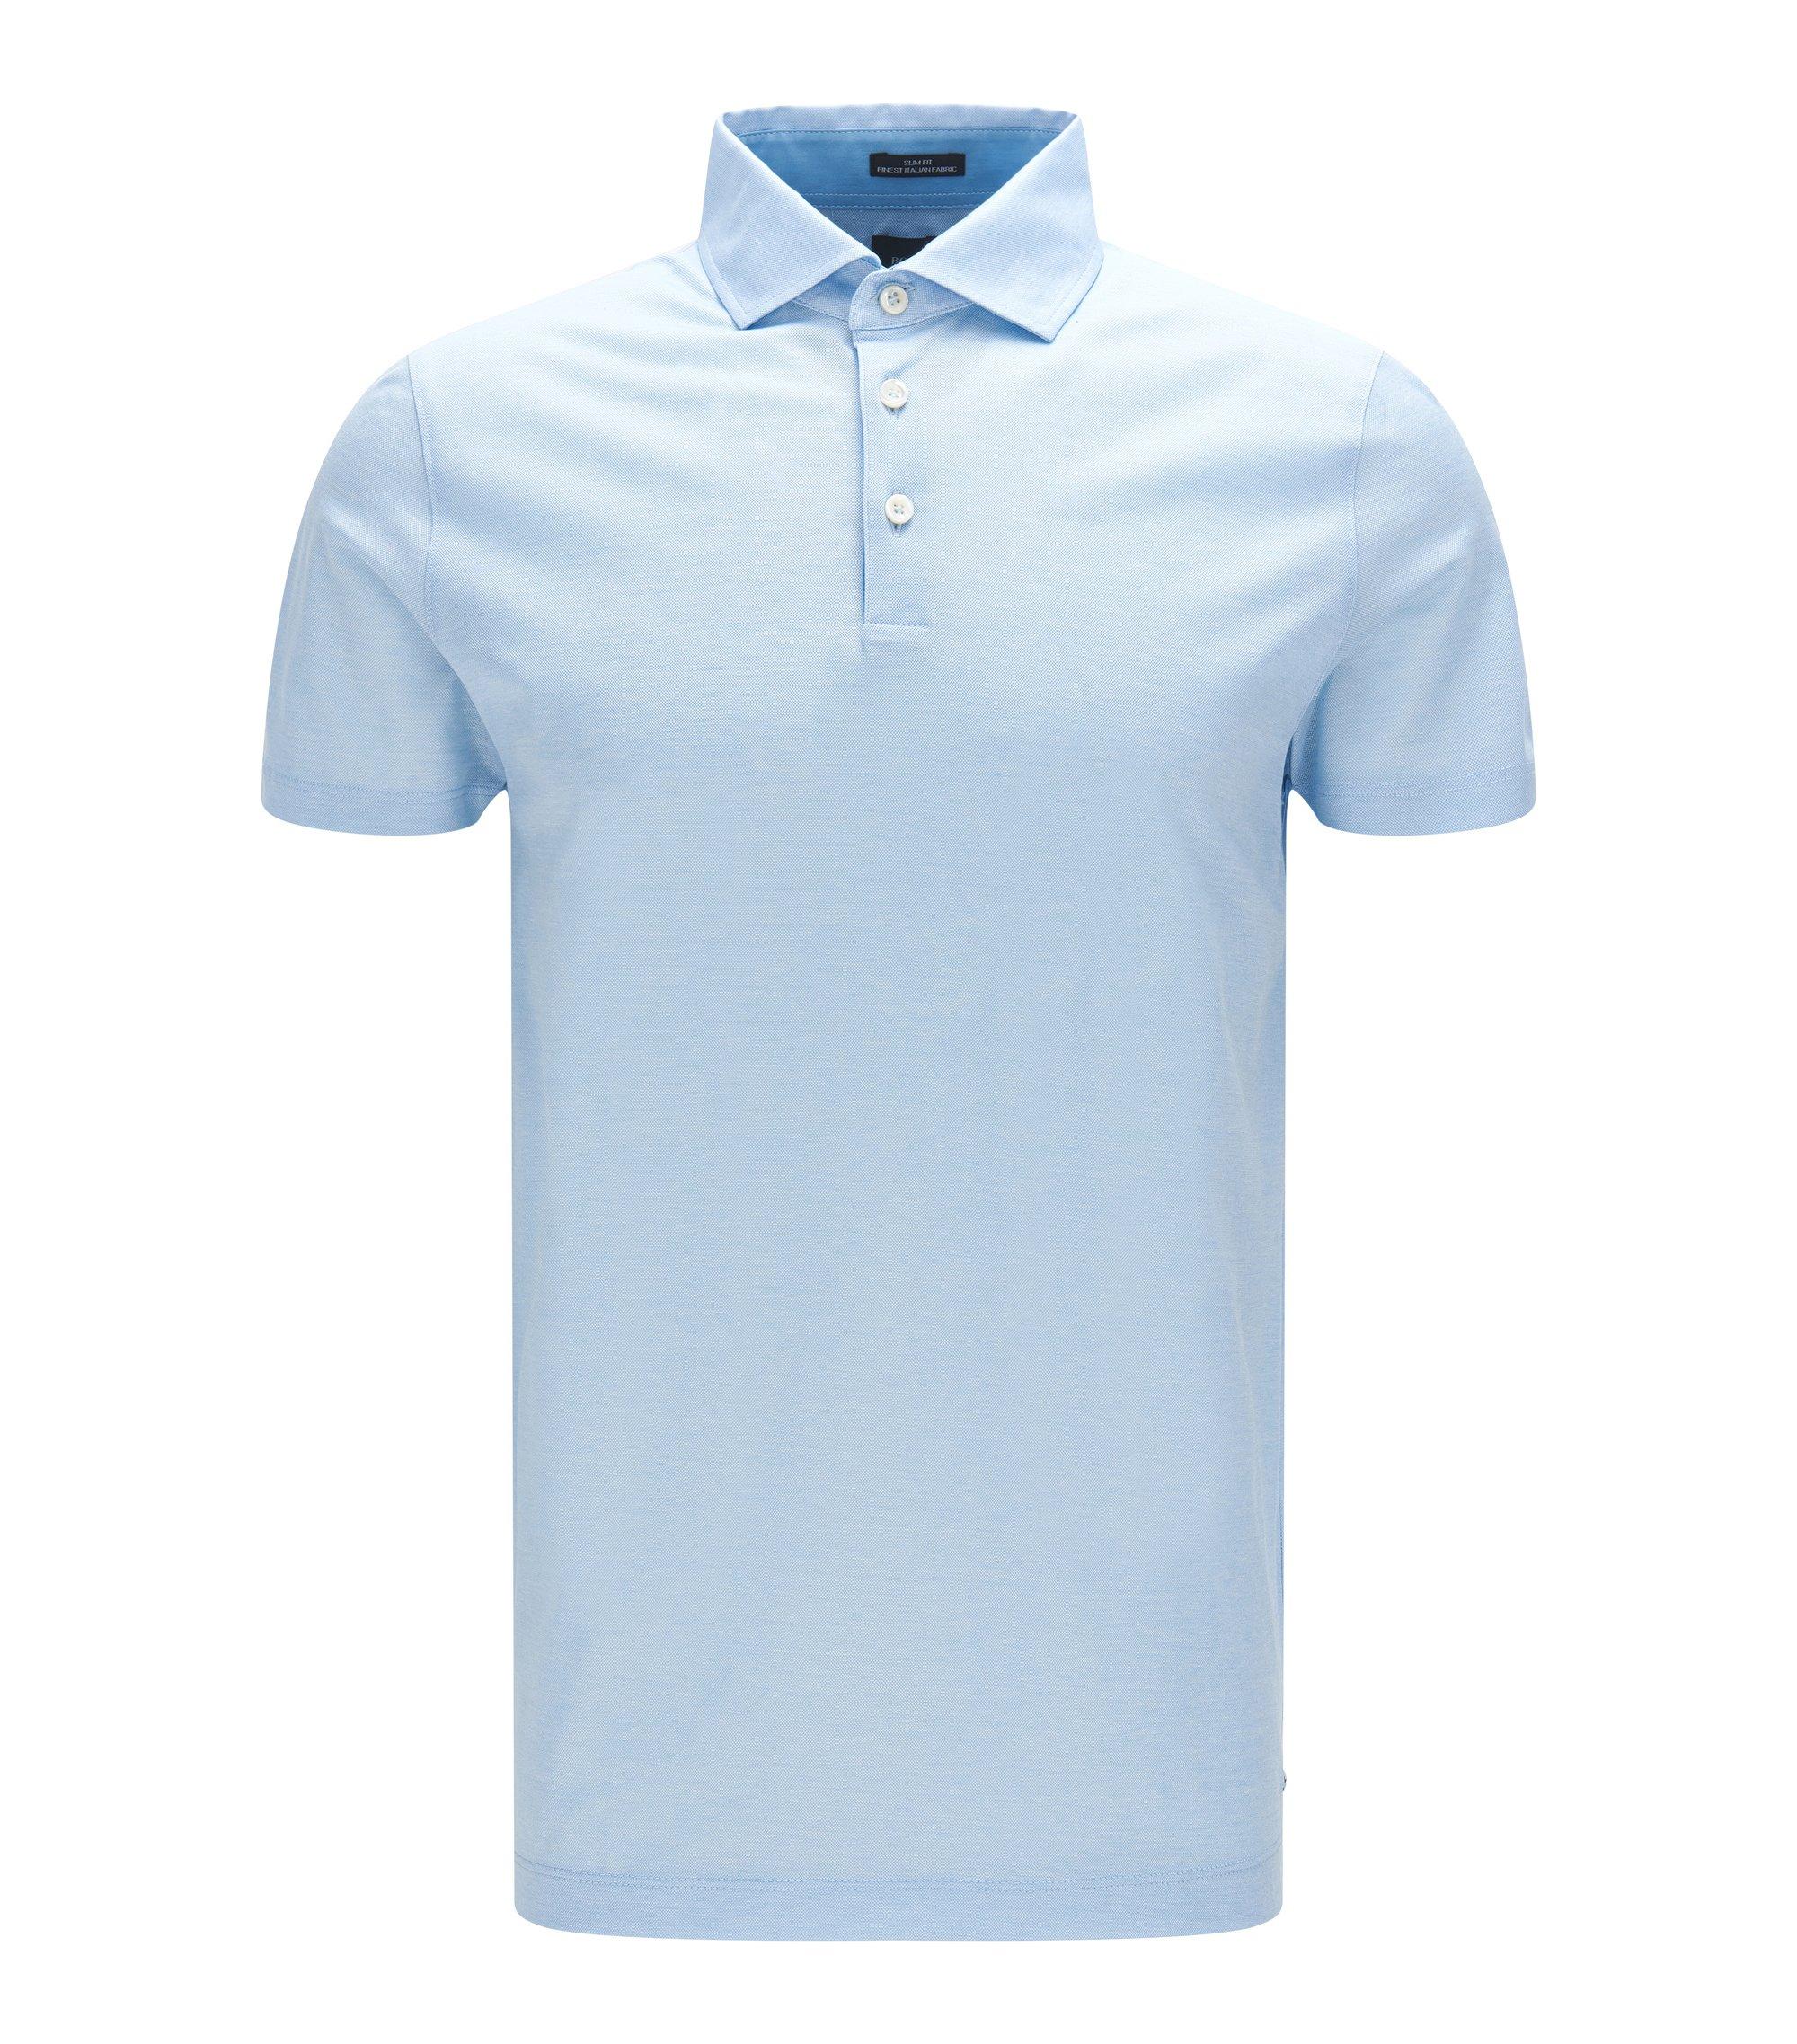 Italian Cotton Jacquard Polo Shirt, Slim Fit | T-Pryde, Light Blue